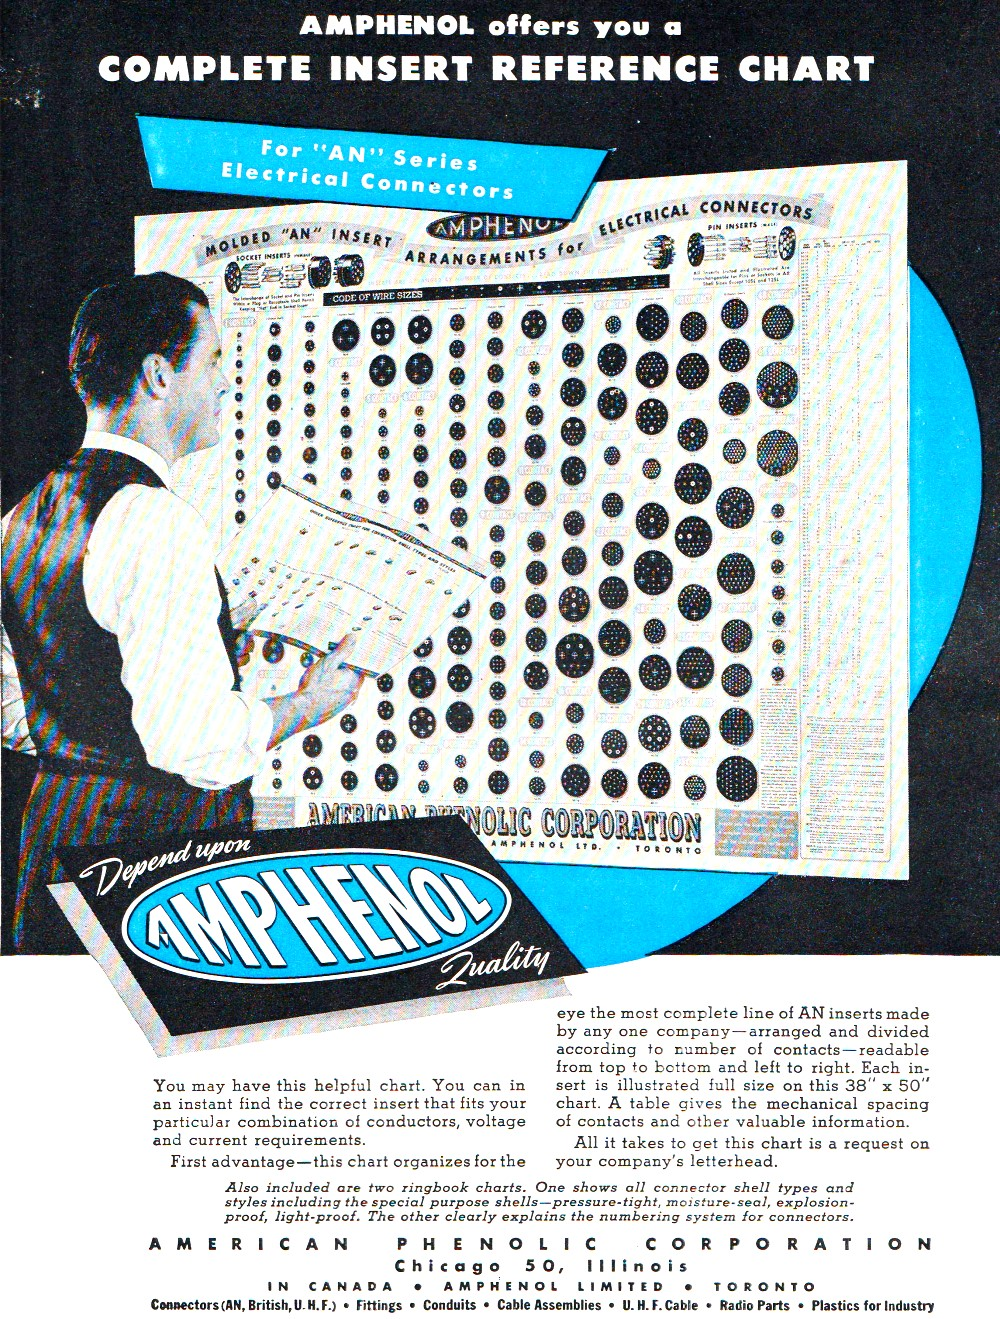 Amphenol Tube Socket Chart, January 1945 Radio News - RF Cafe